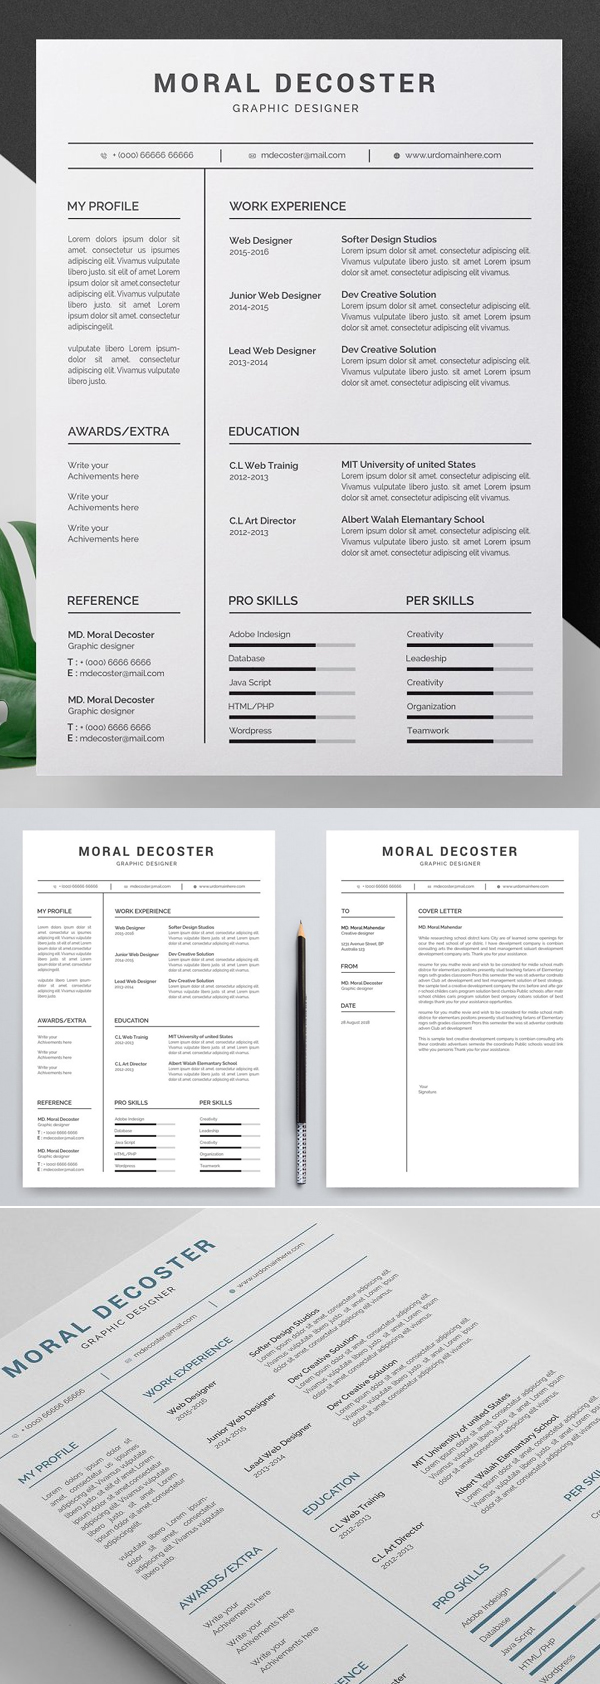 50 Best Resume Templates Of 2020 - 4